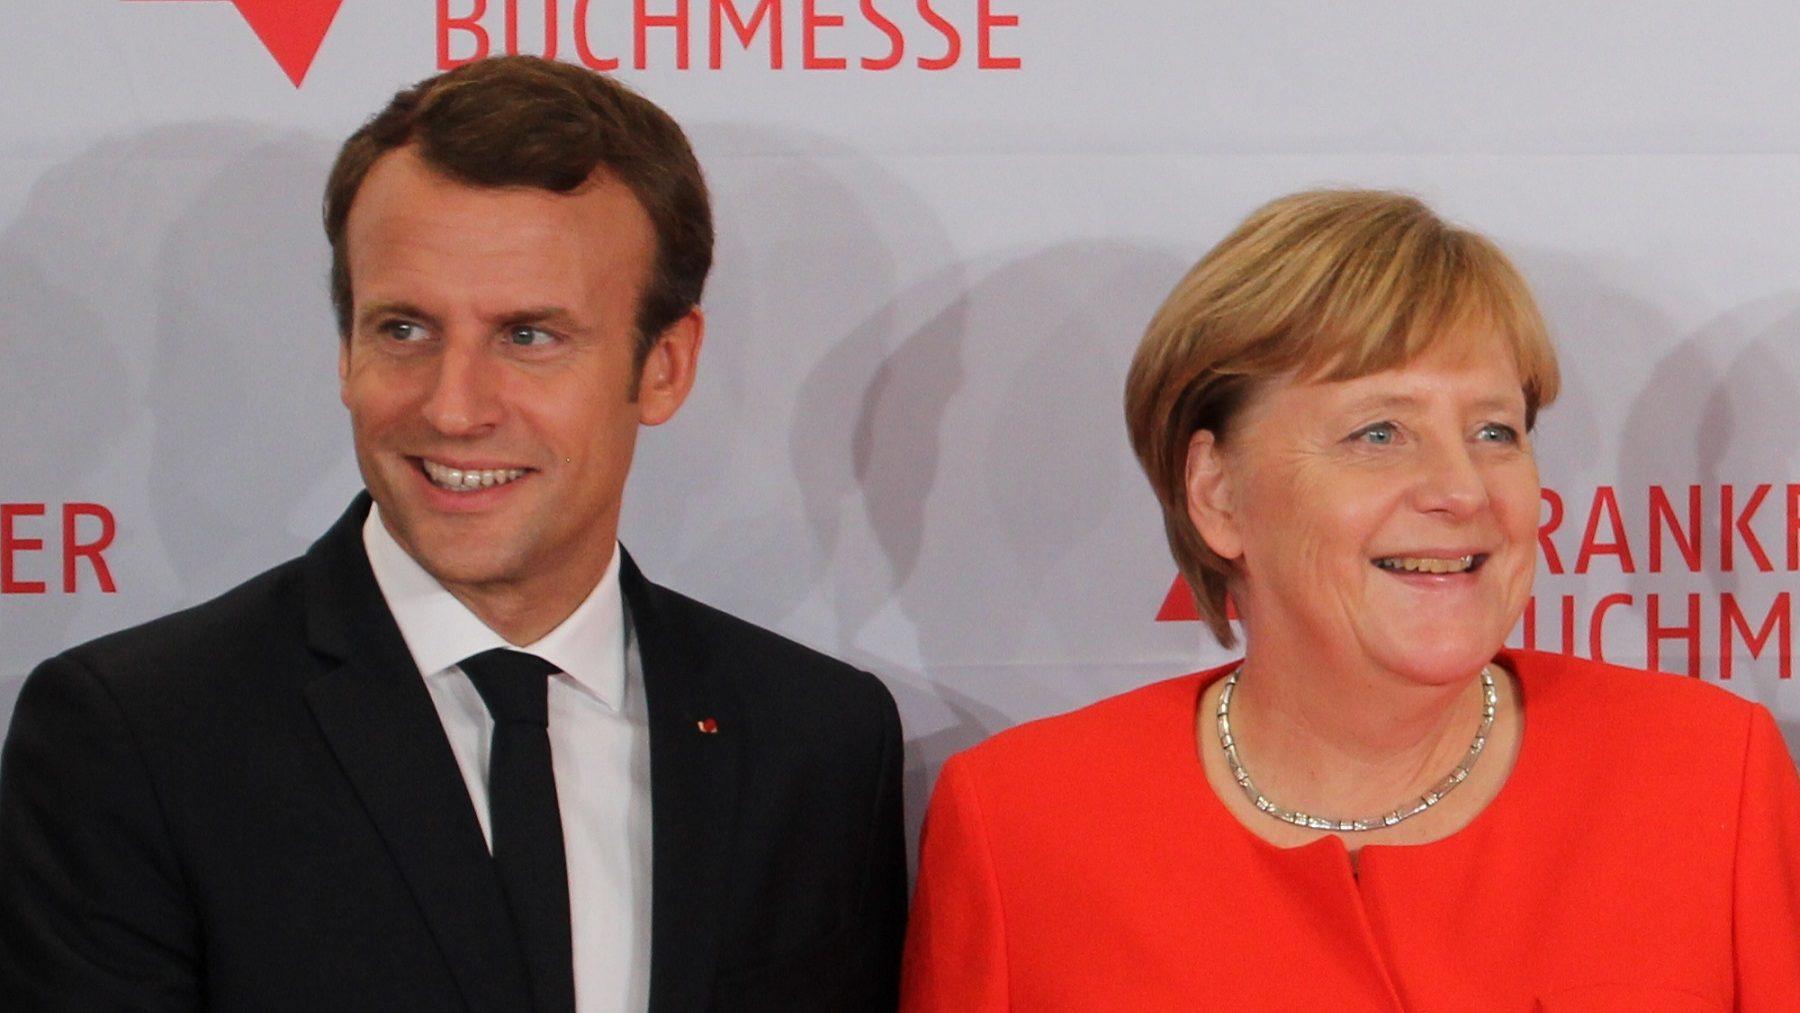 Acordo Merkel-Macron terá impacto na banca portuguesa. Bancos só poderão ter 5% de malparado